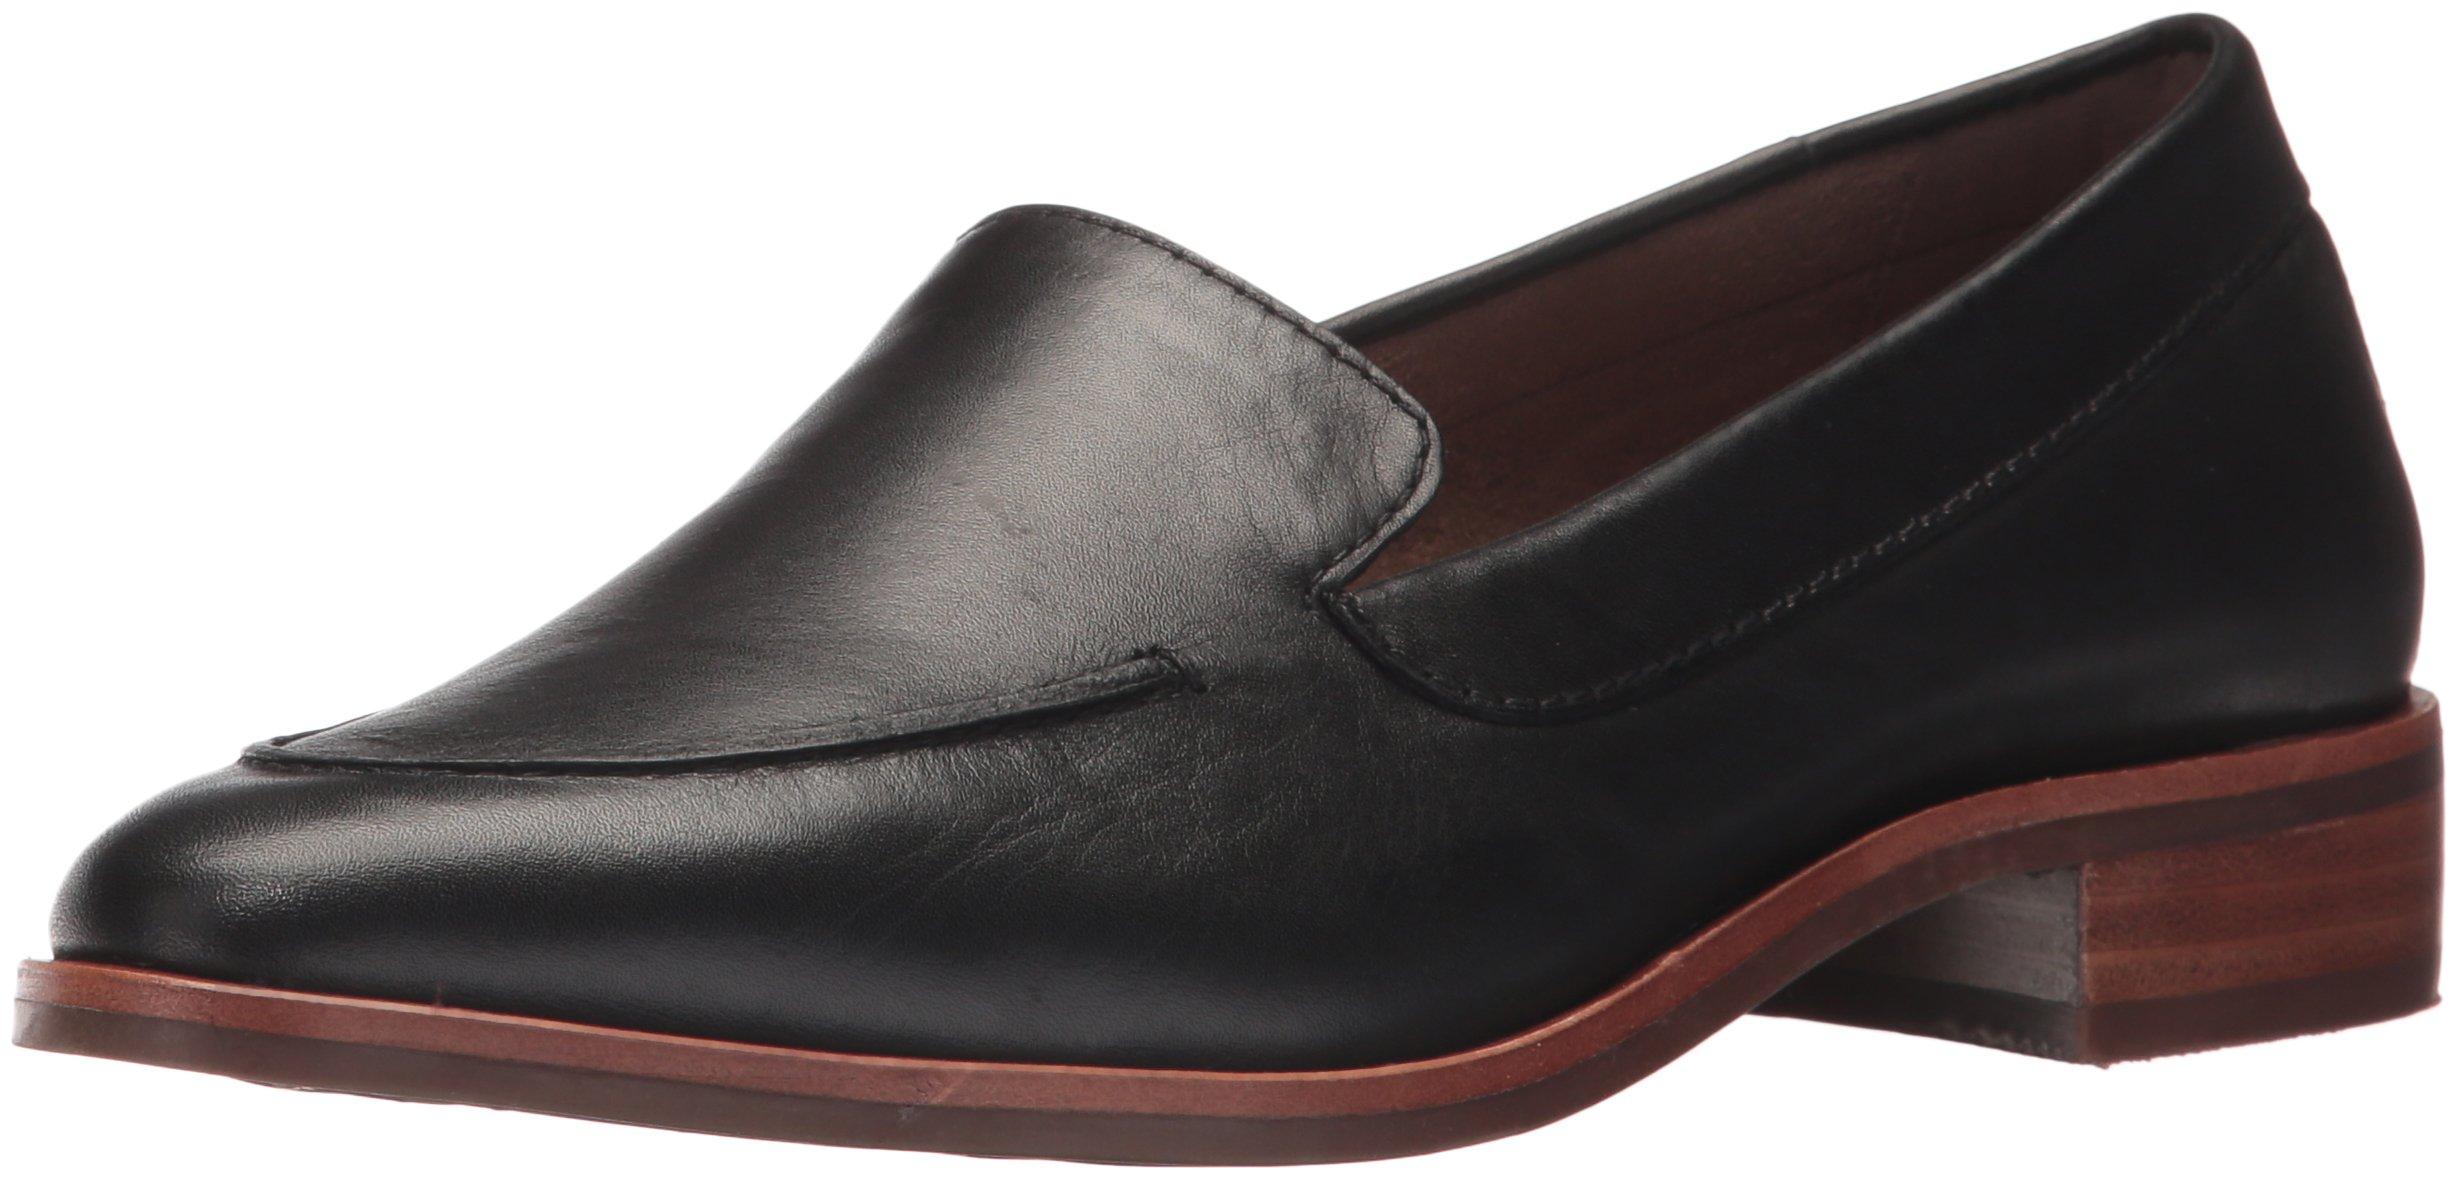 Aerosoles Women's East Side Loafer, Black Leather, 8 M US